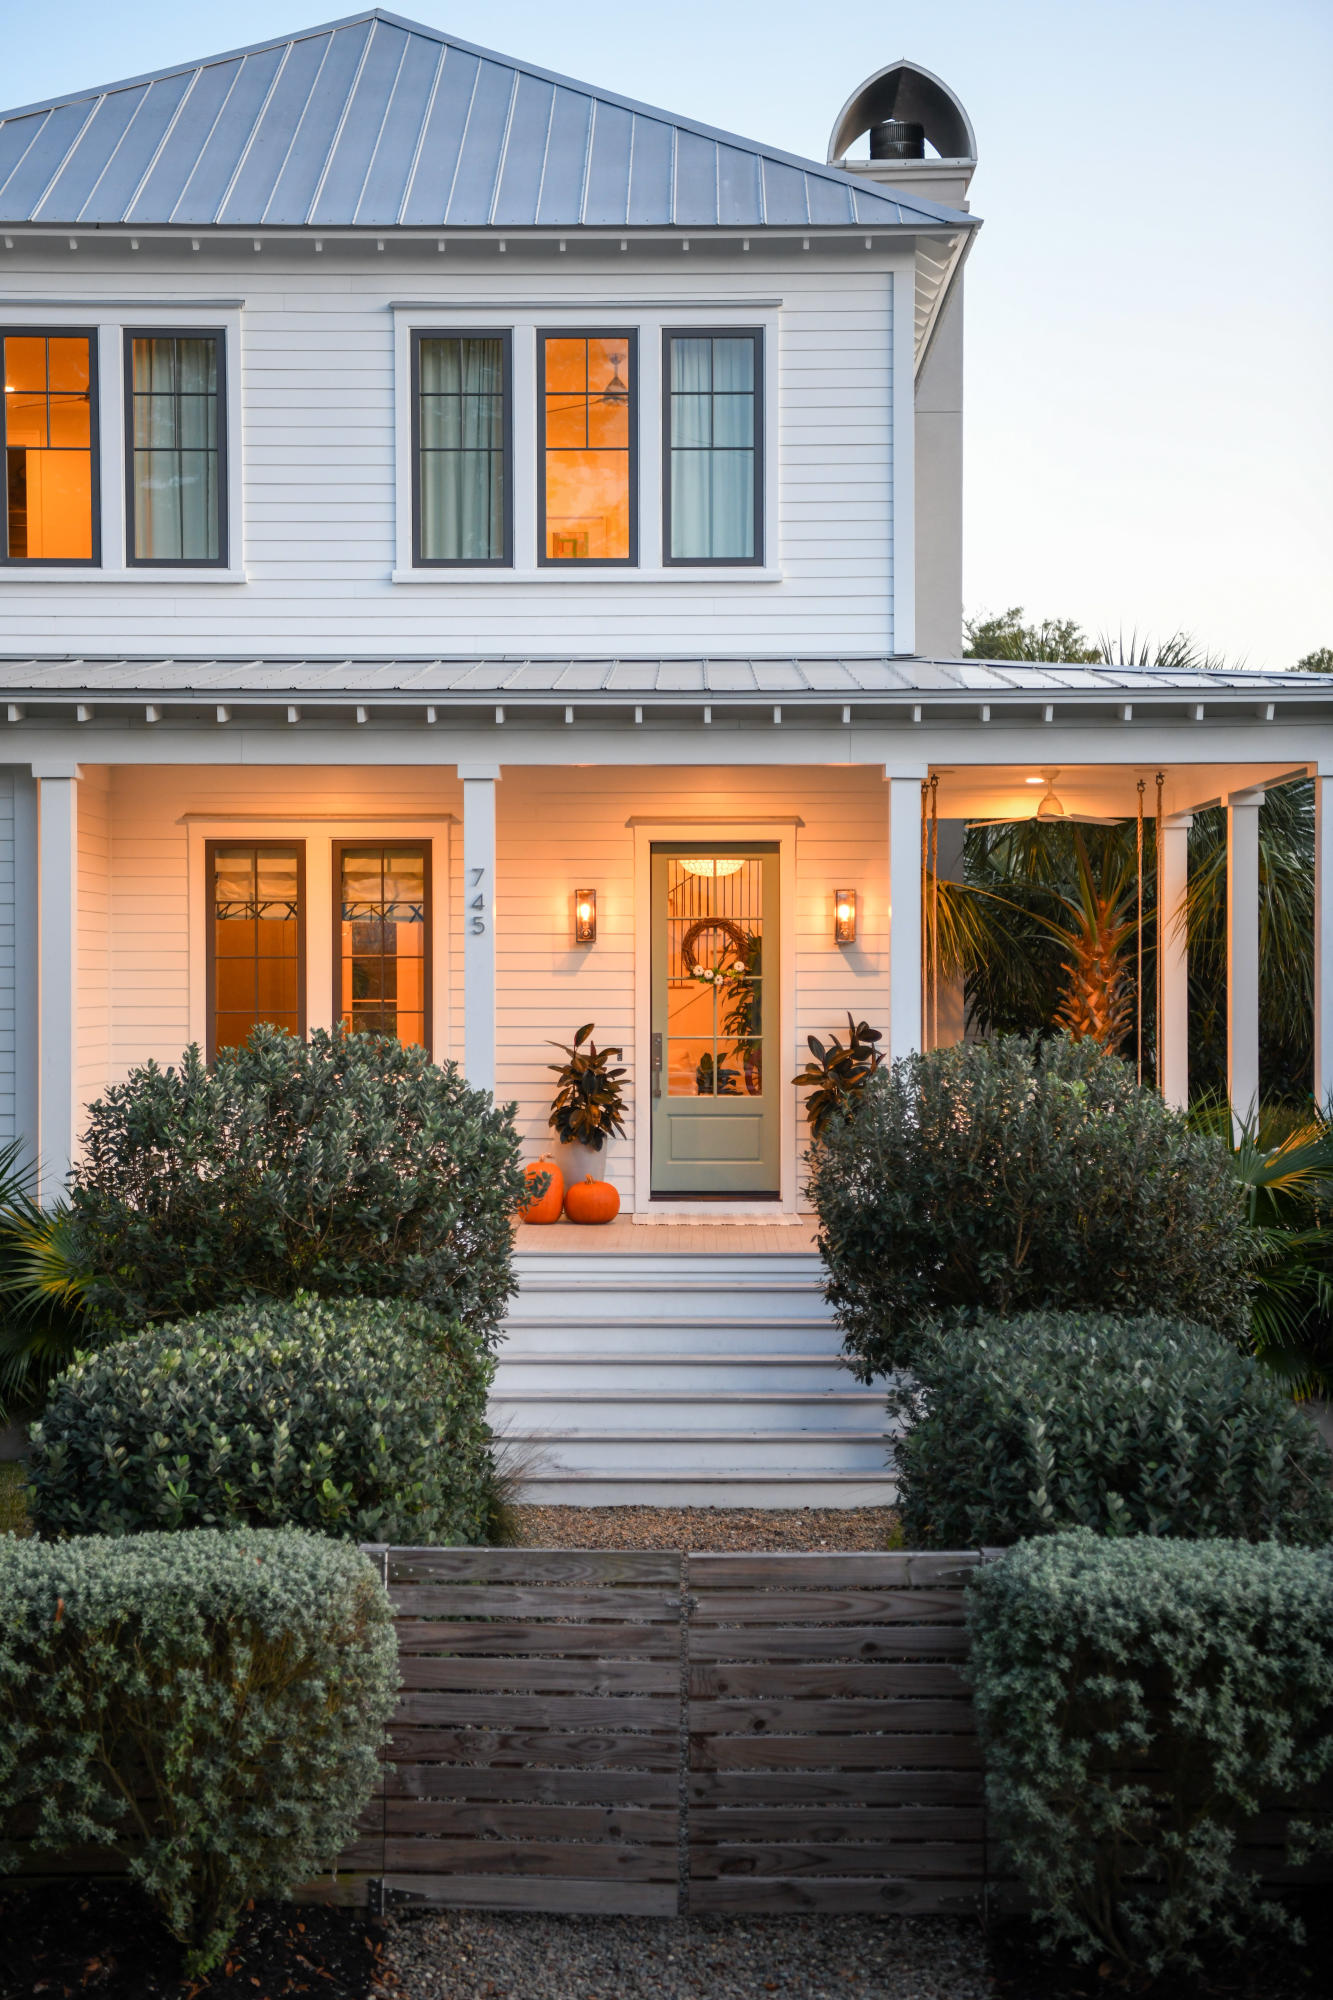 Old Mt Pleasant Homes For Sale - 745 Winthrop, Mount Pleasant, SC - 2